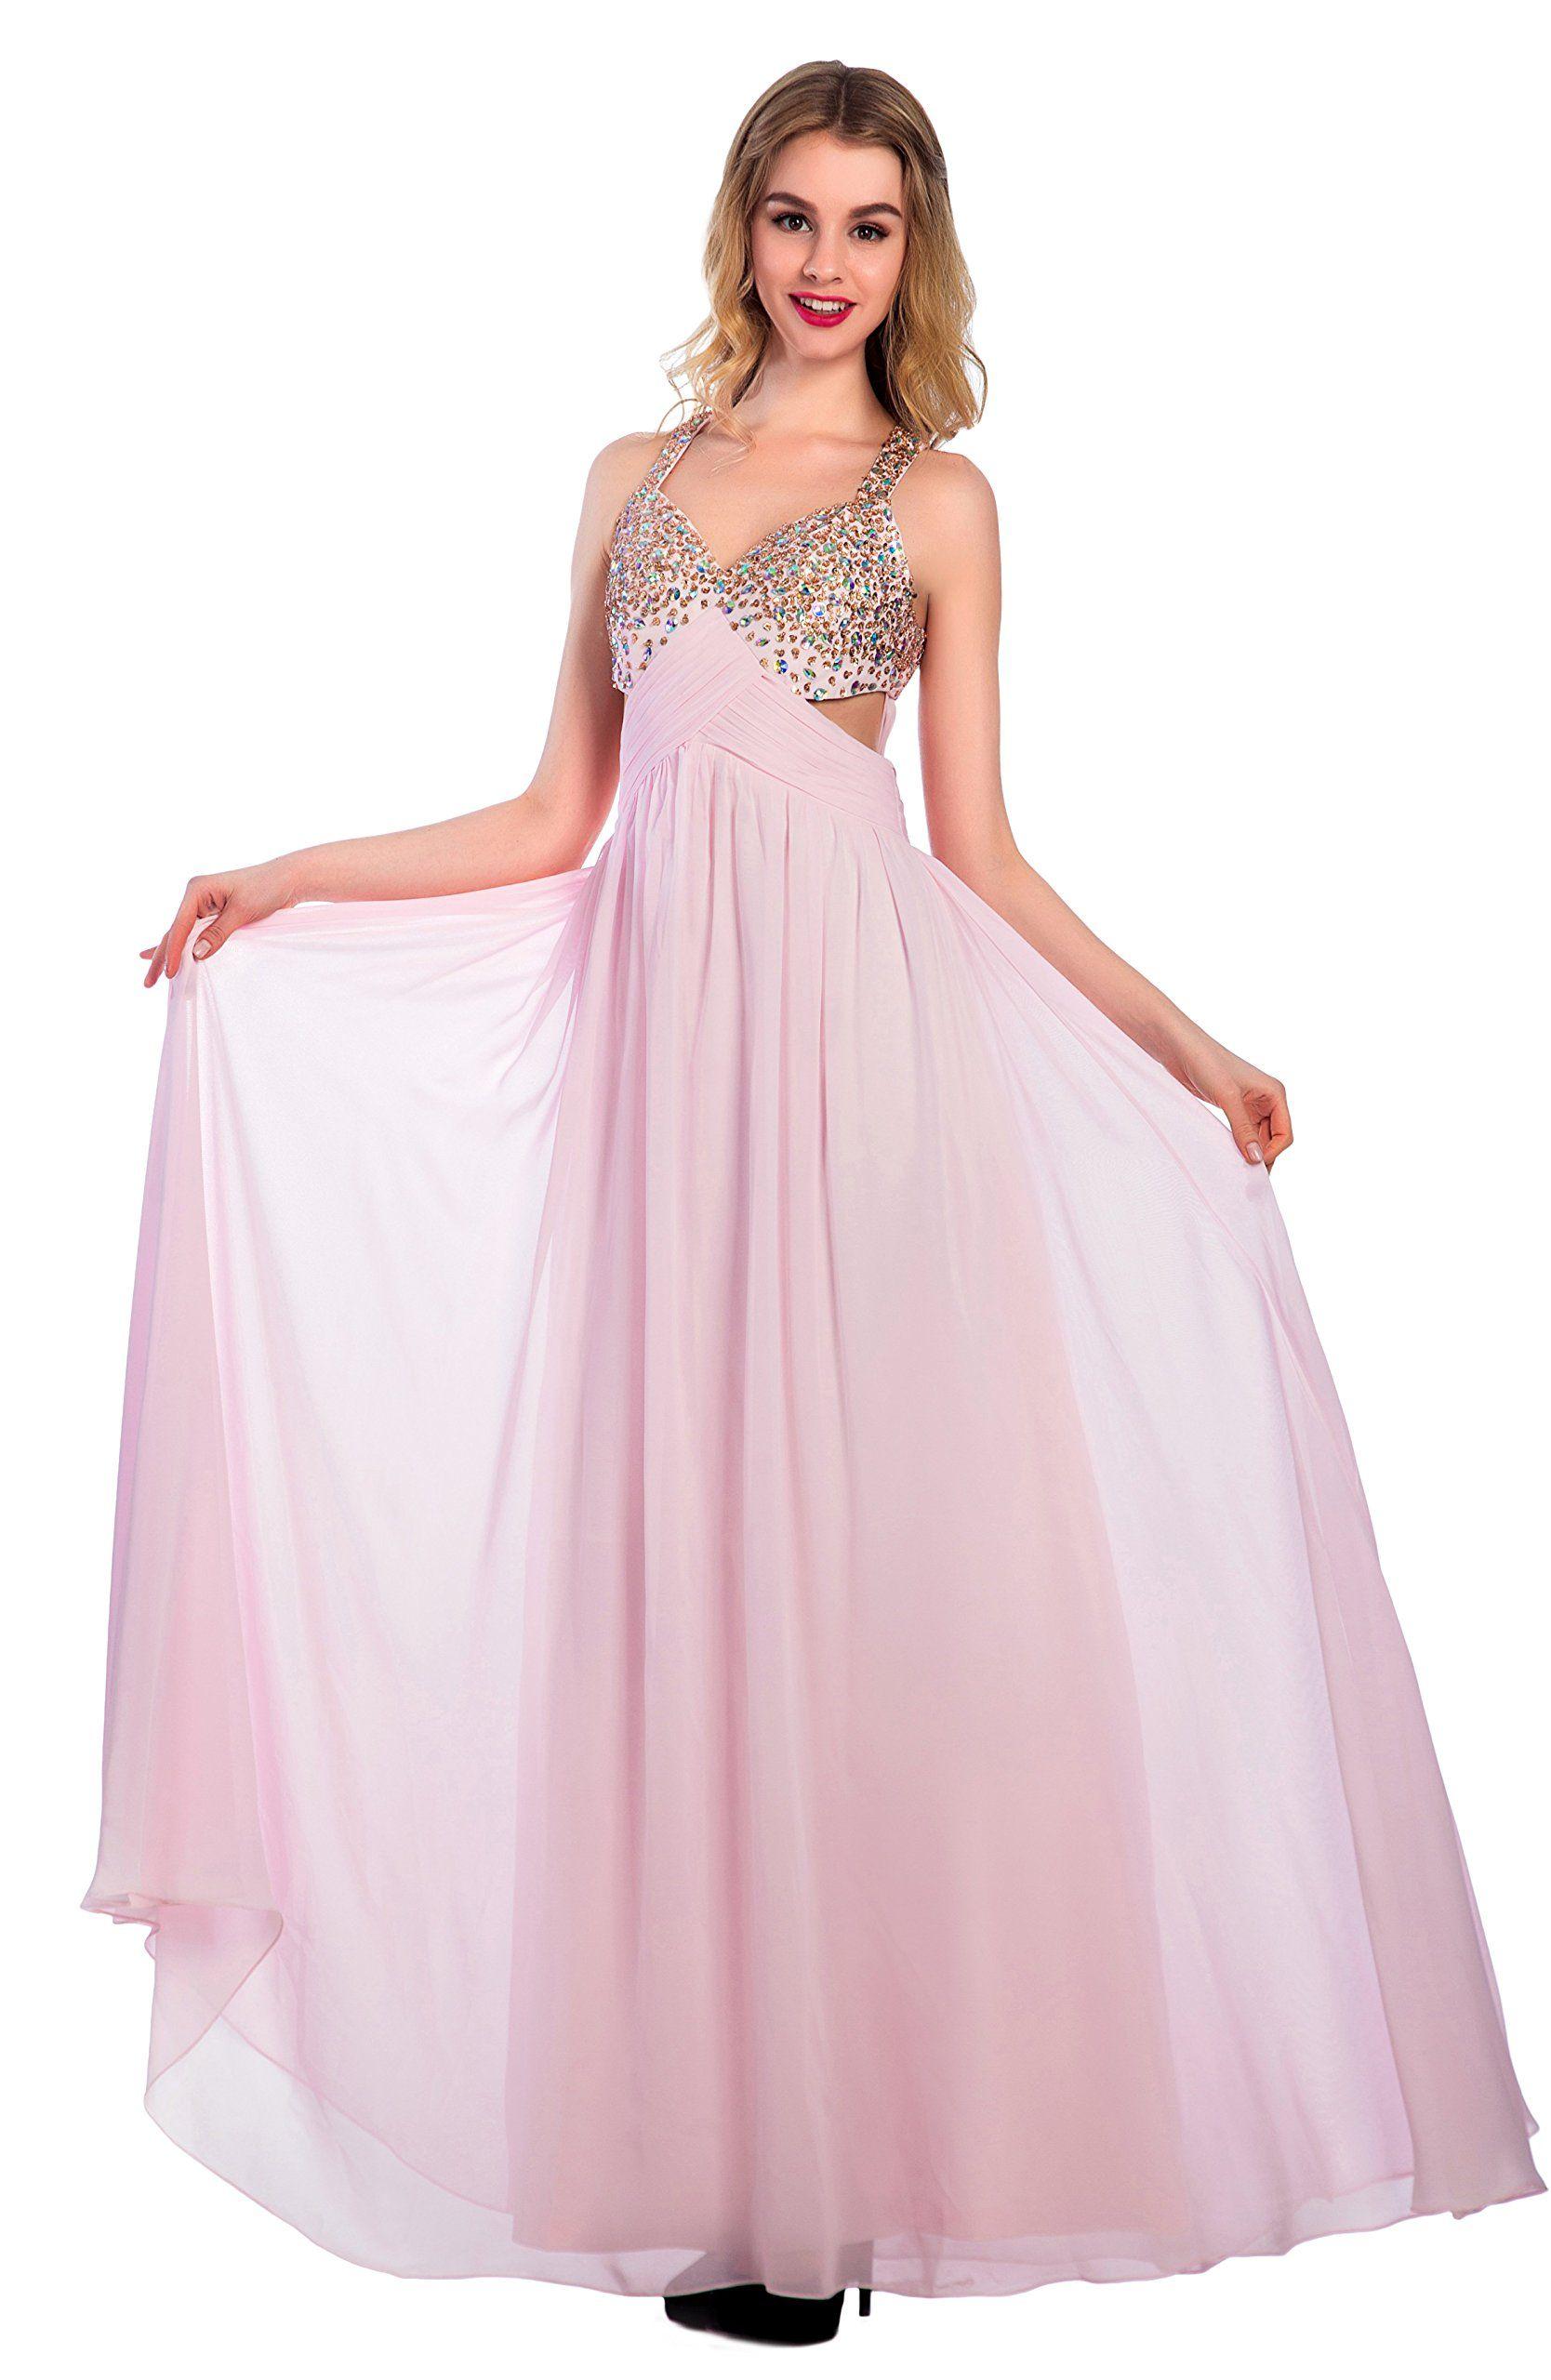 Kiss rain womenus long chiffon crystal prom dresses formal evening